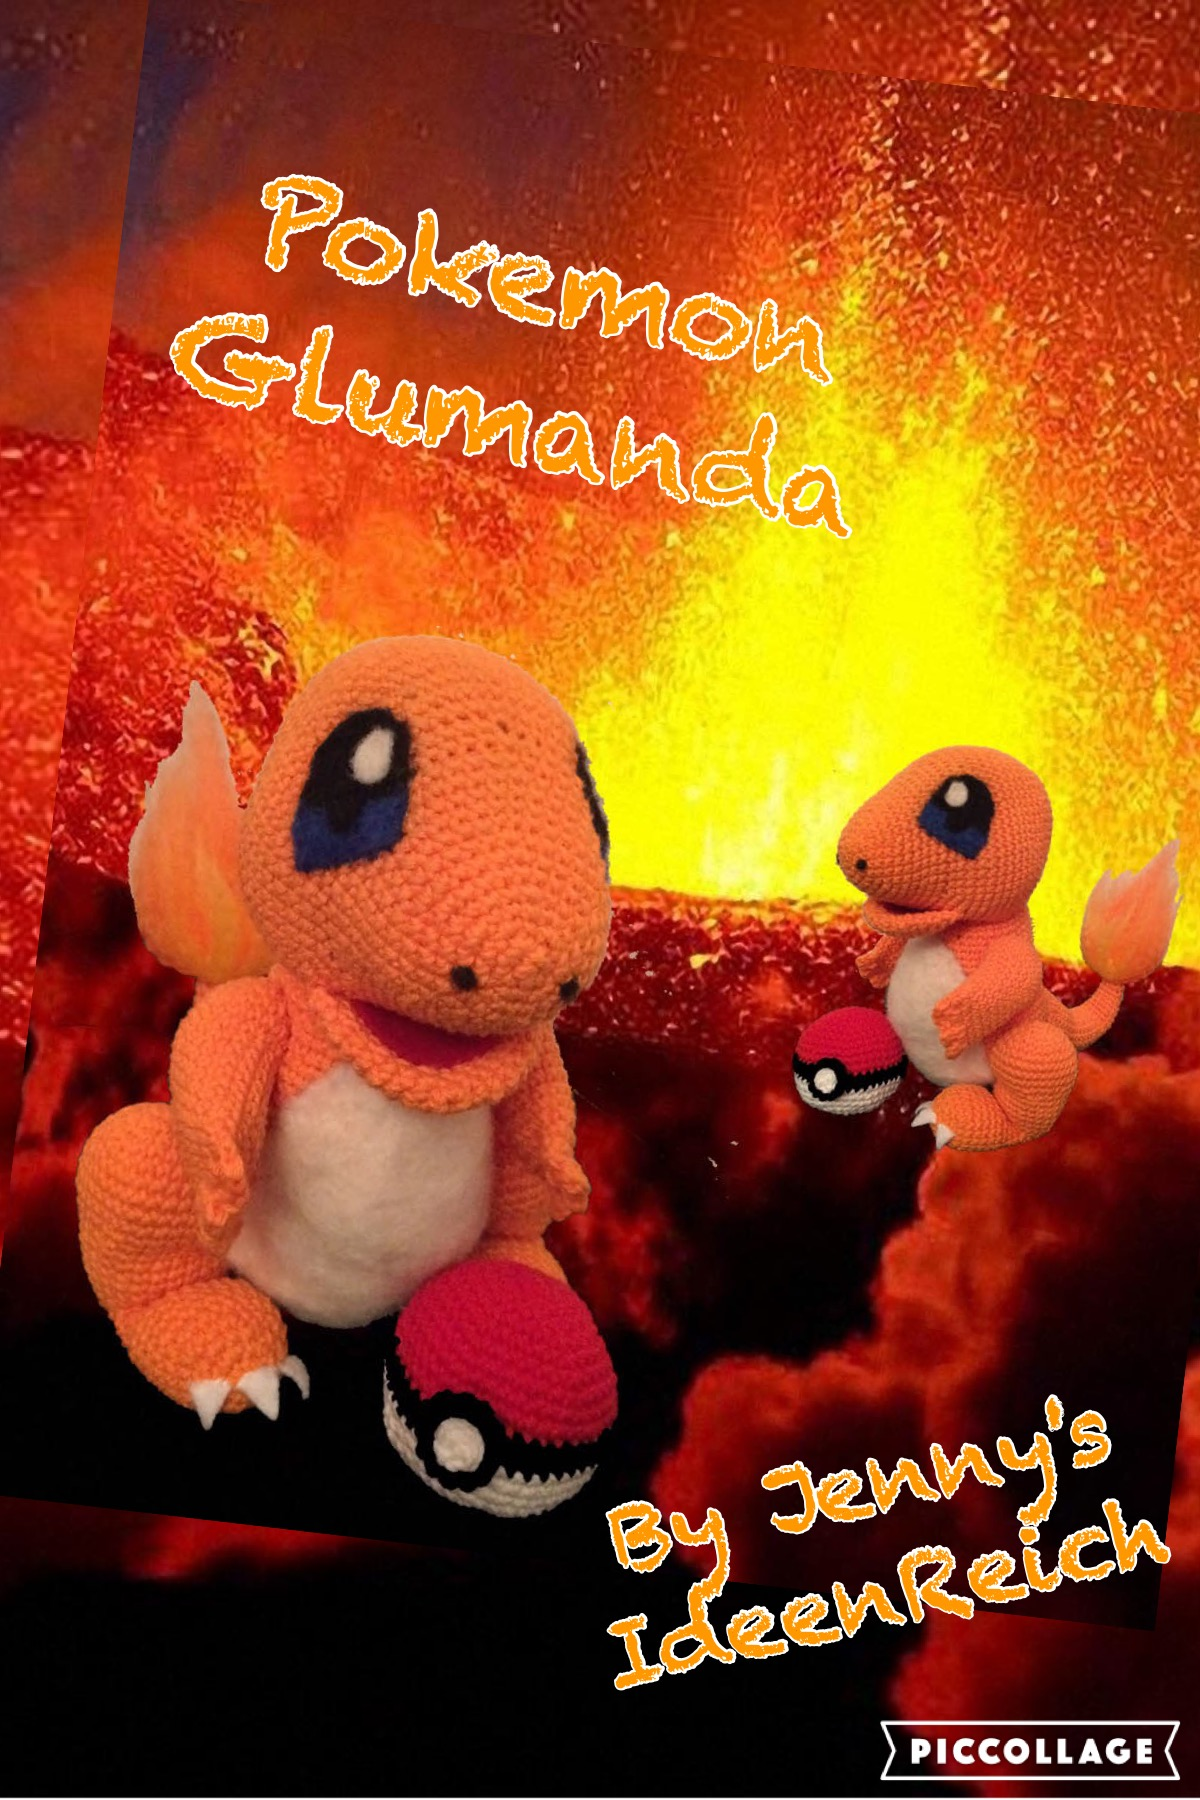 pokemon_glumanda_haekeln_jennys_ideenreich.JPG